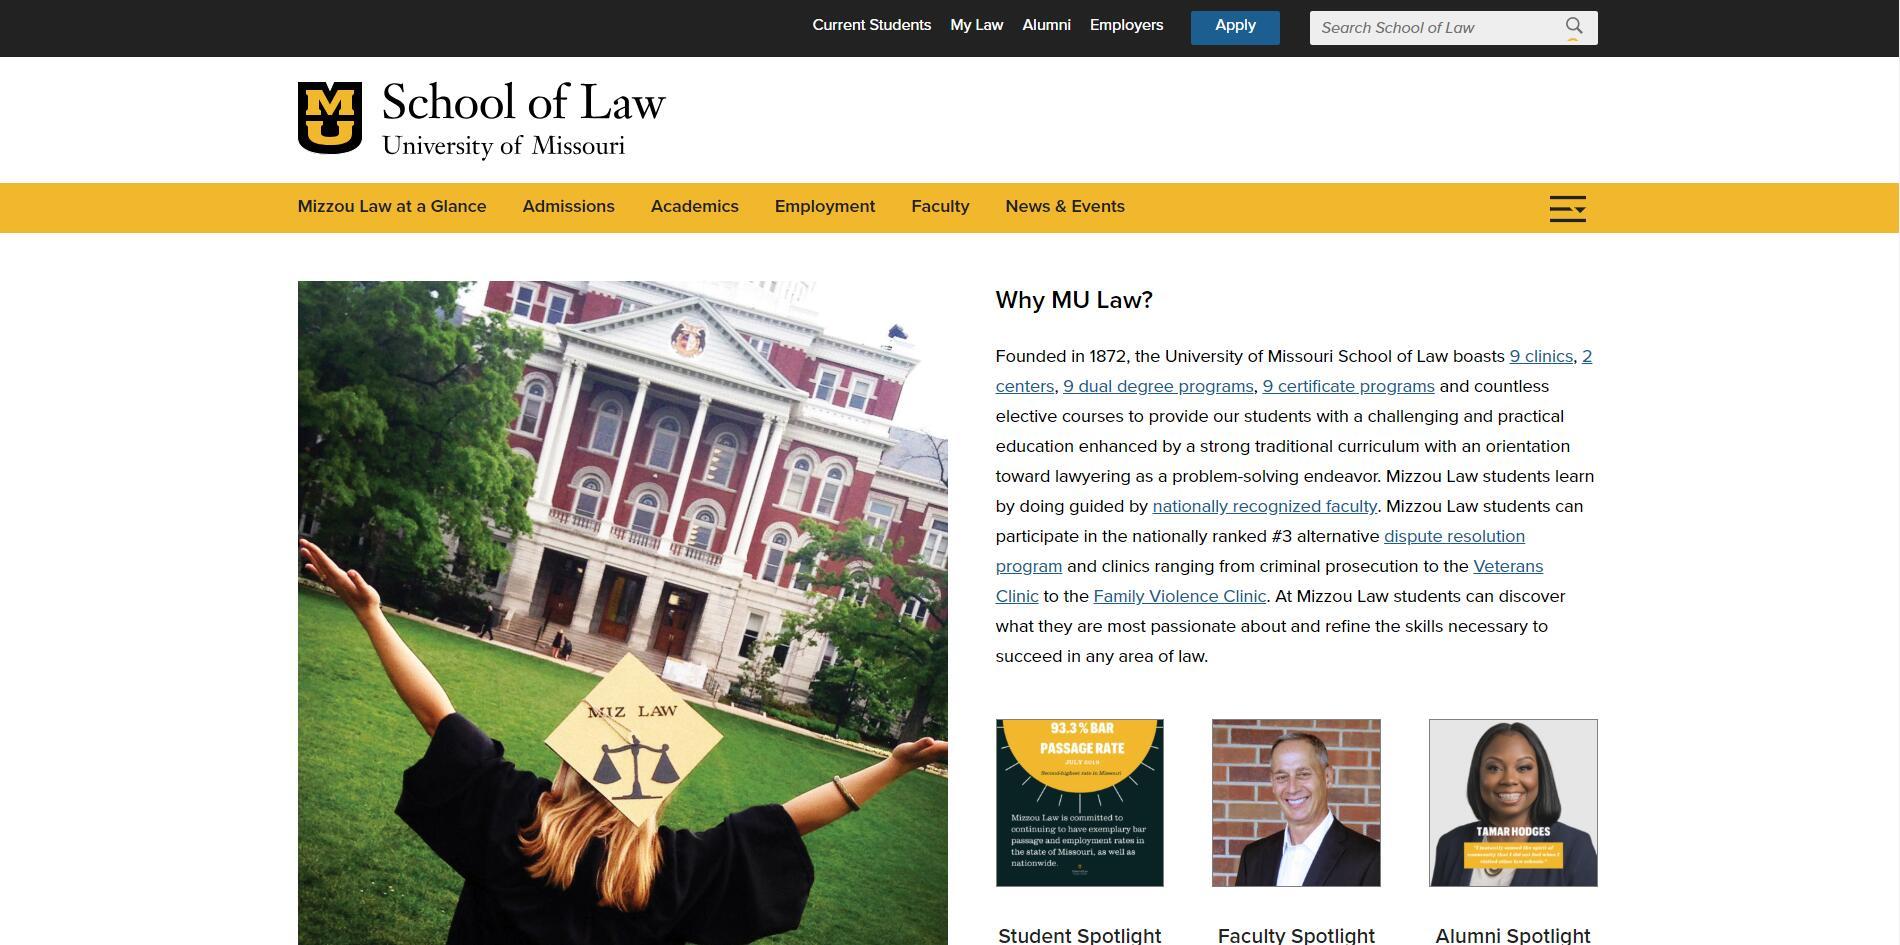 The School of Law at University of Missouri